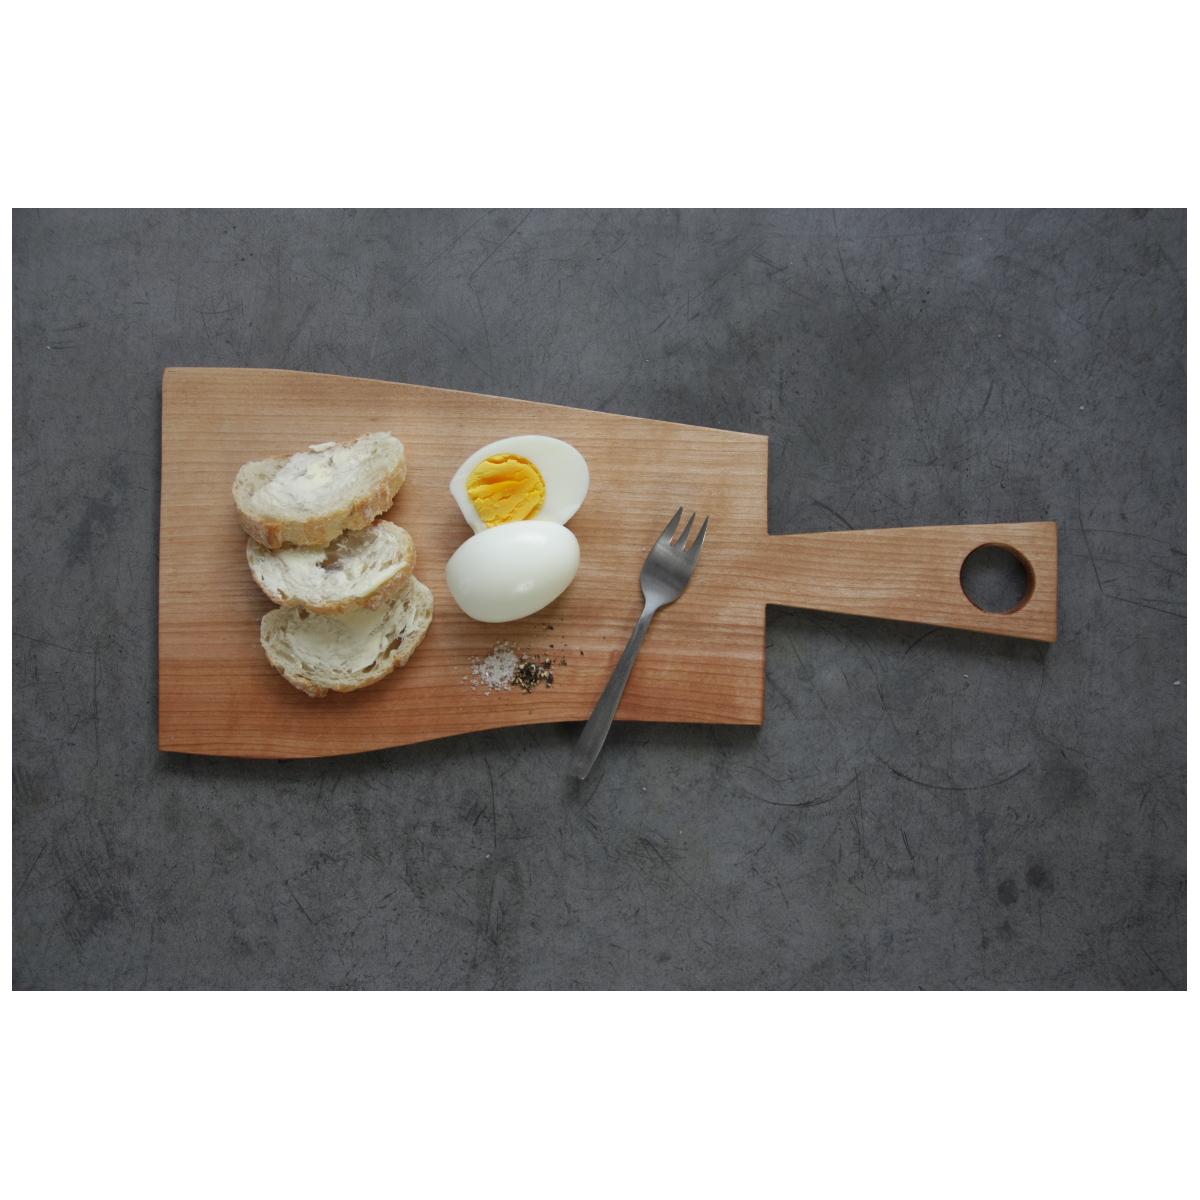 JK Custom Furniture: Cheese Board